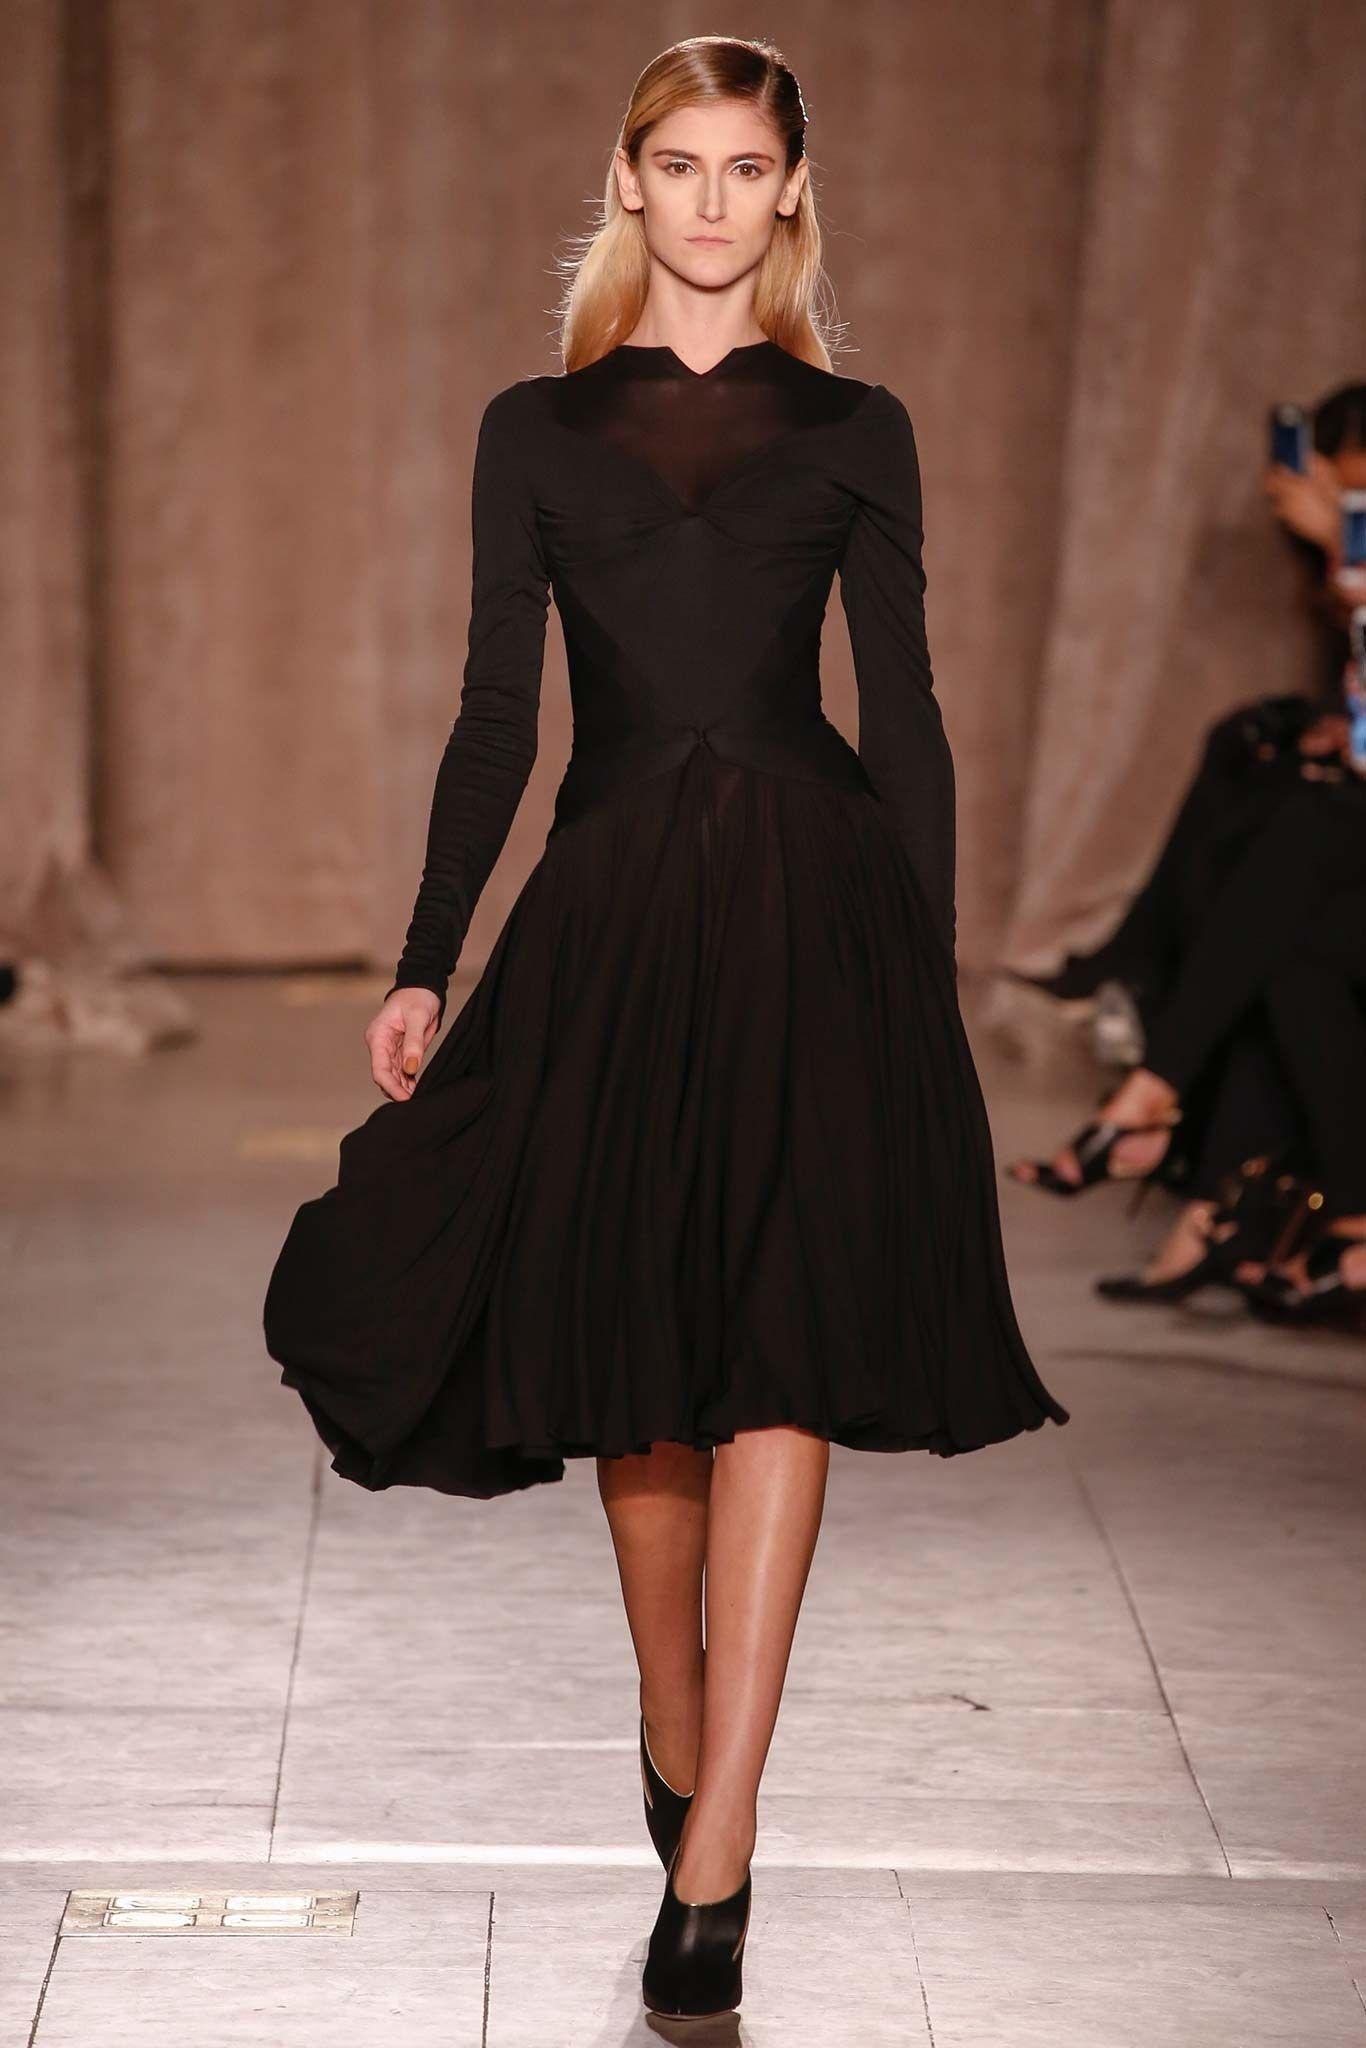 Fashion style Zac fall posen runway for lady